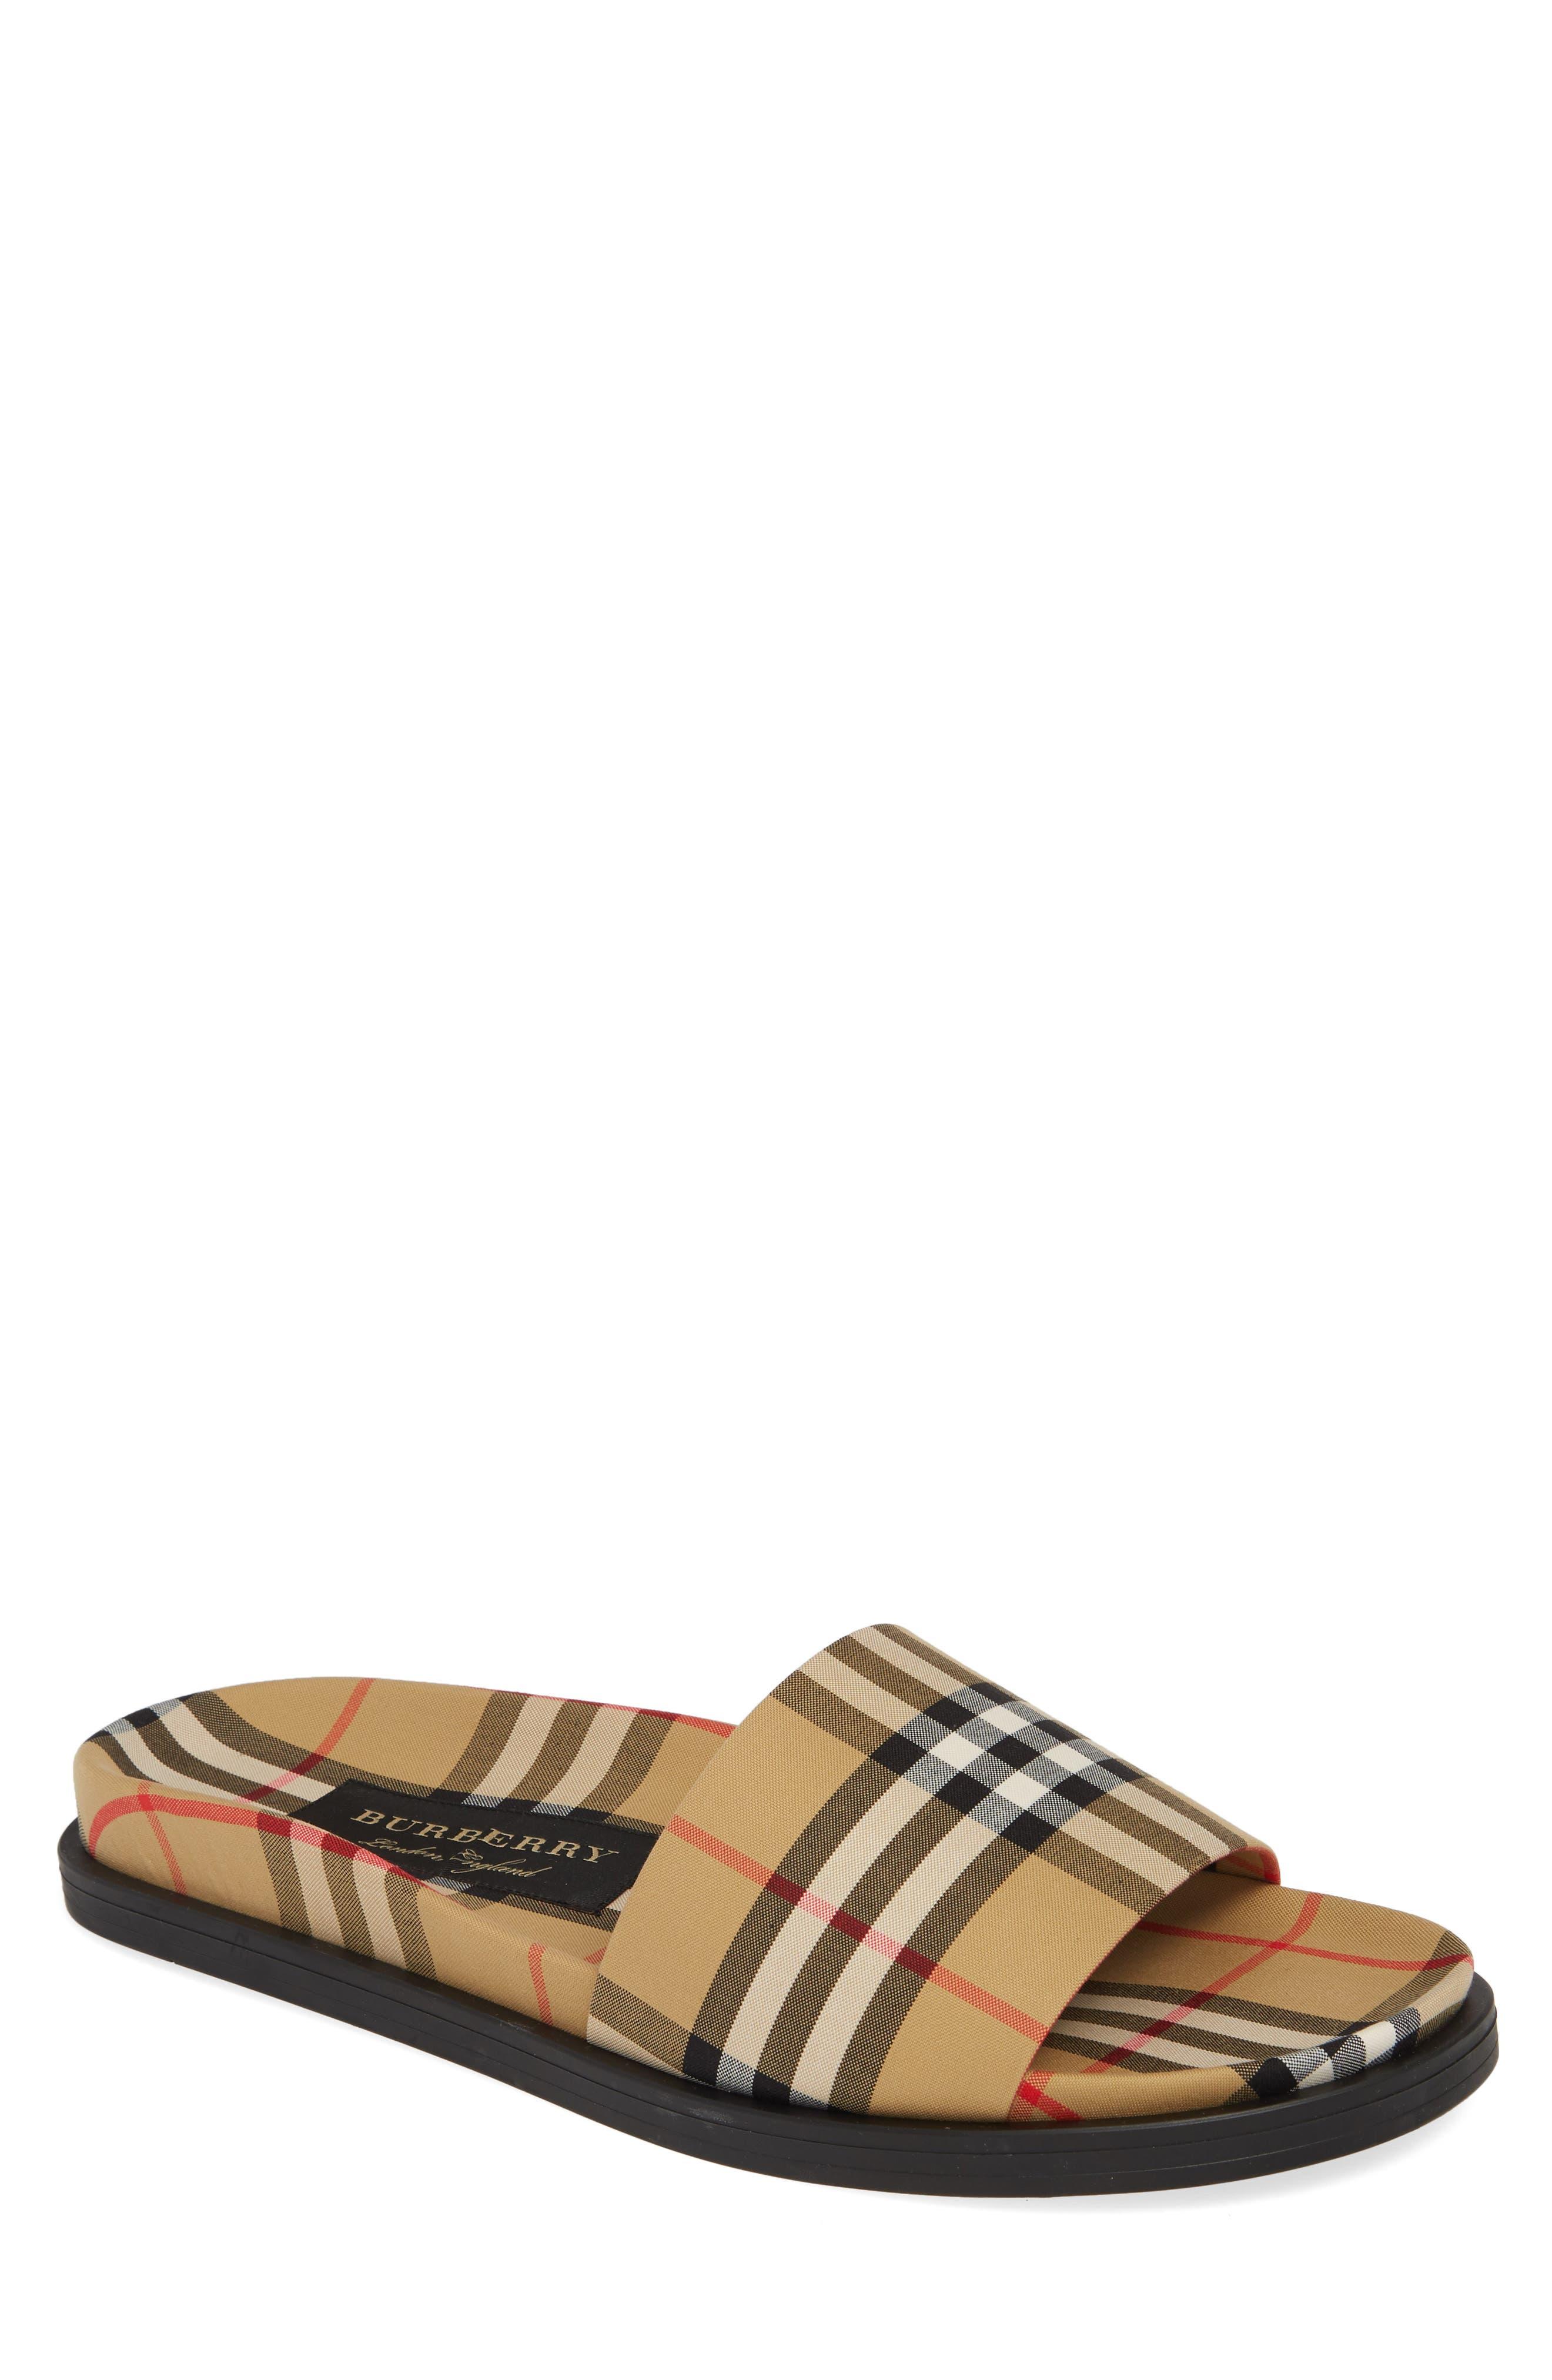 cfbe72dd0 Men s Burberry Sandals